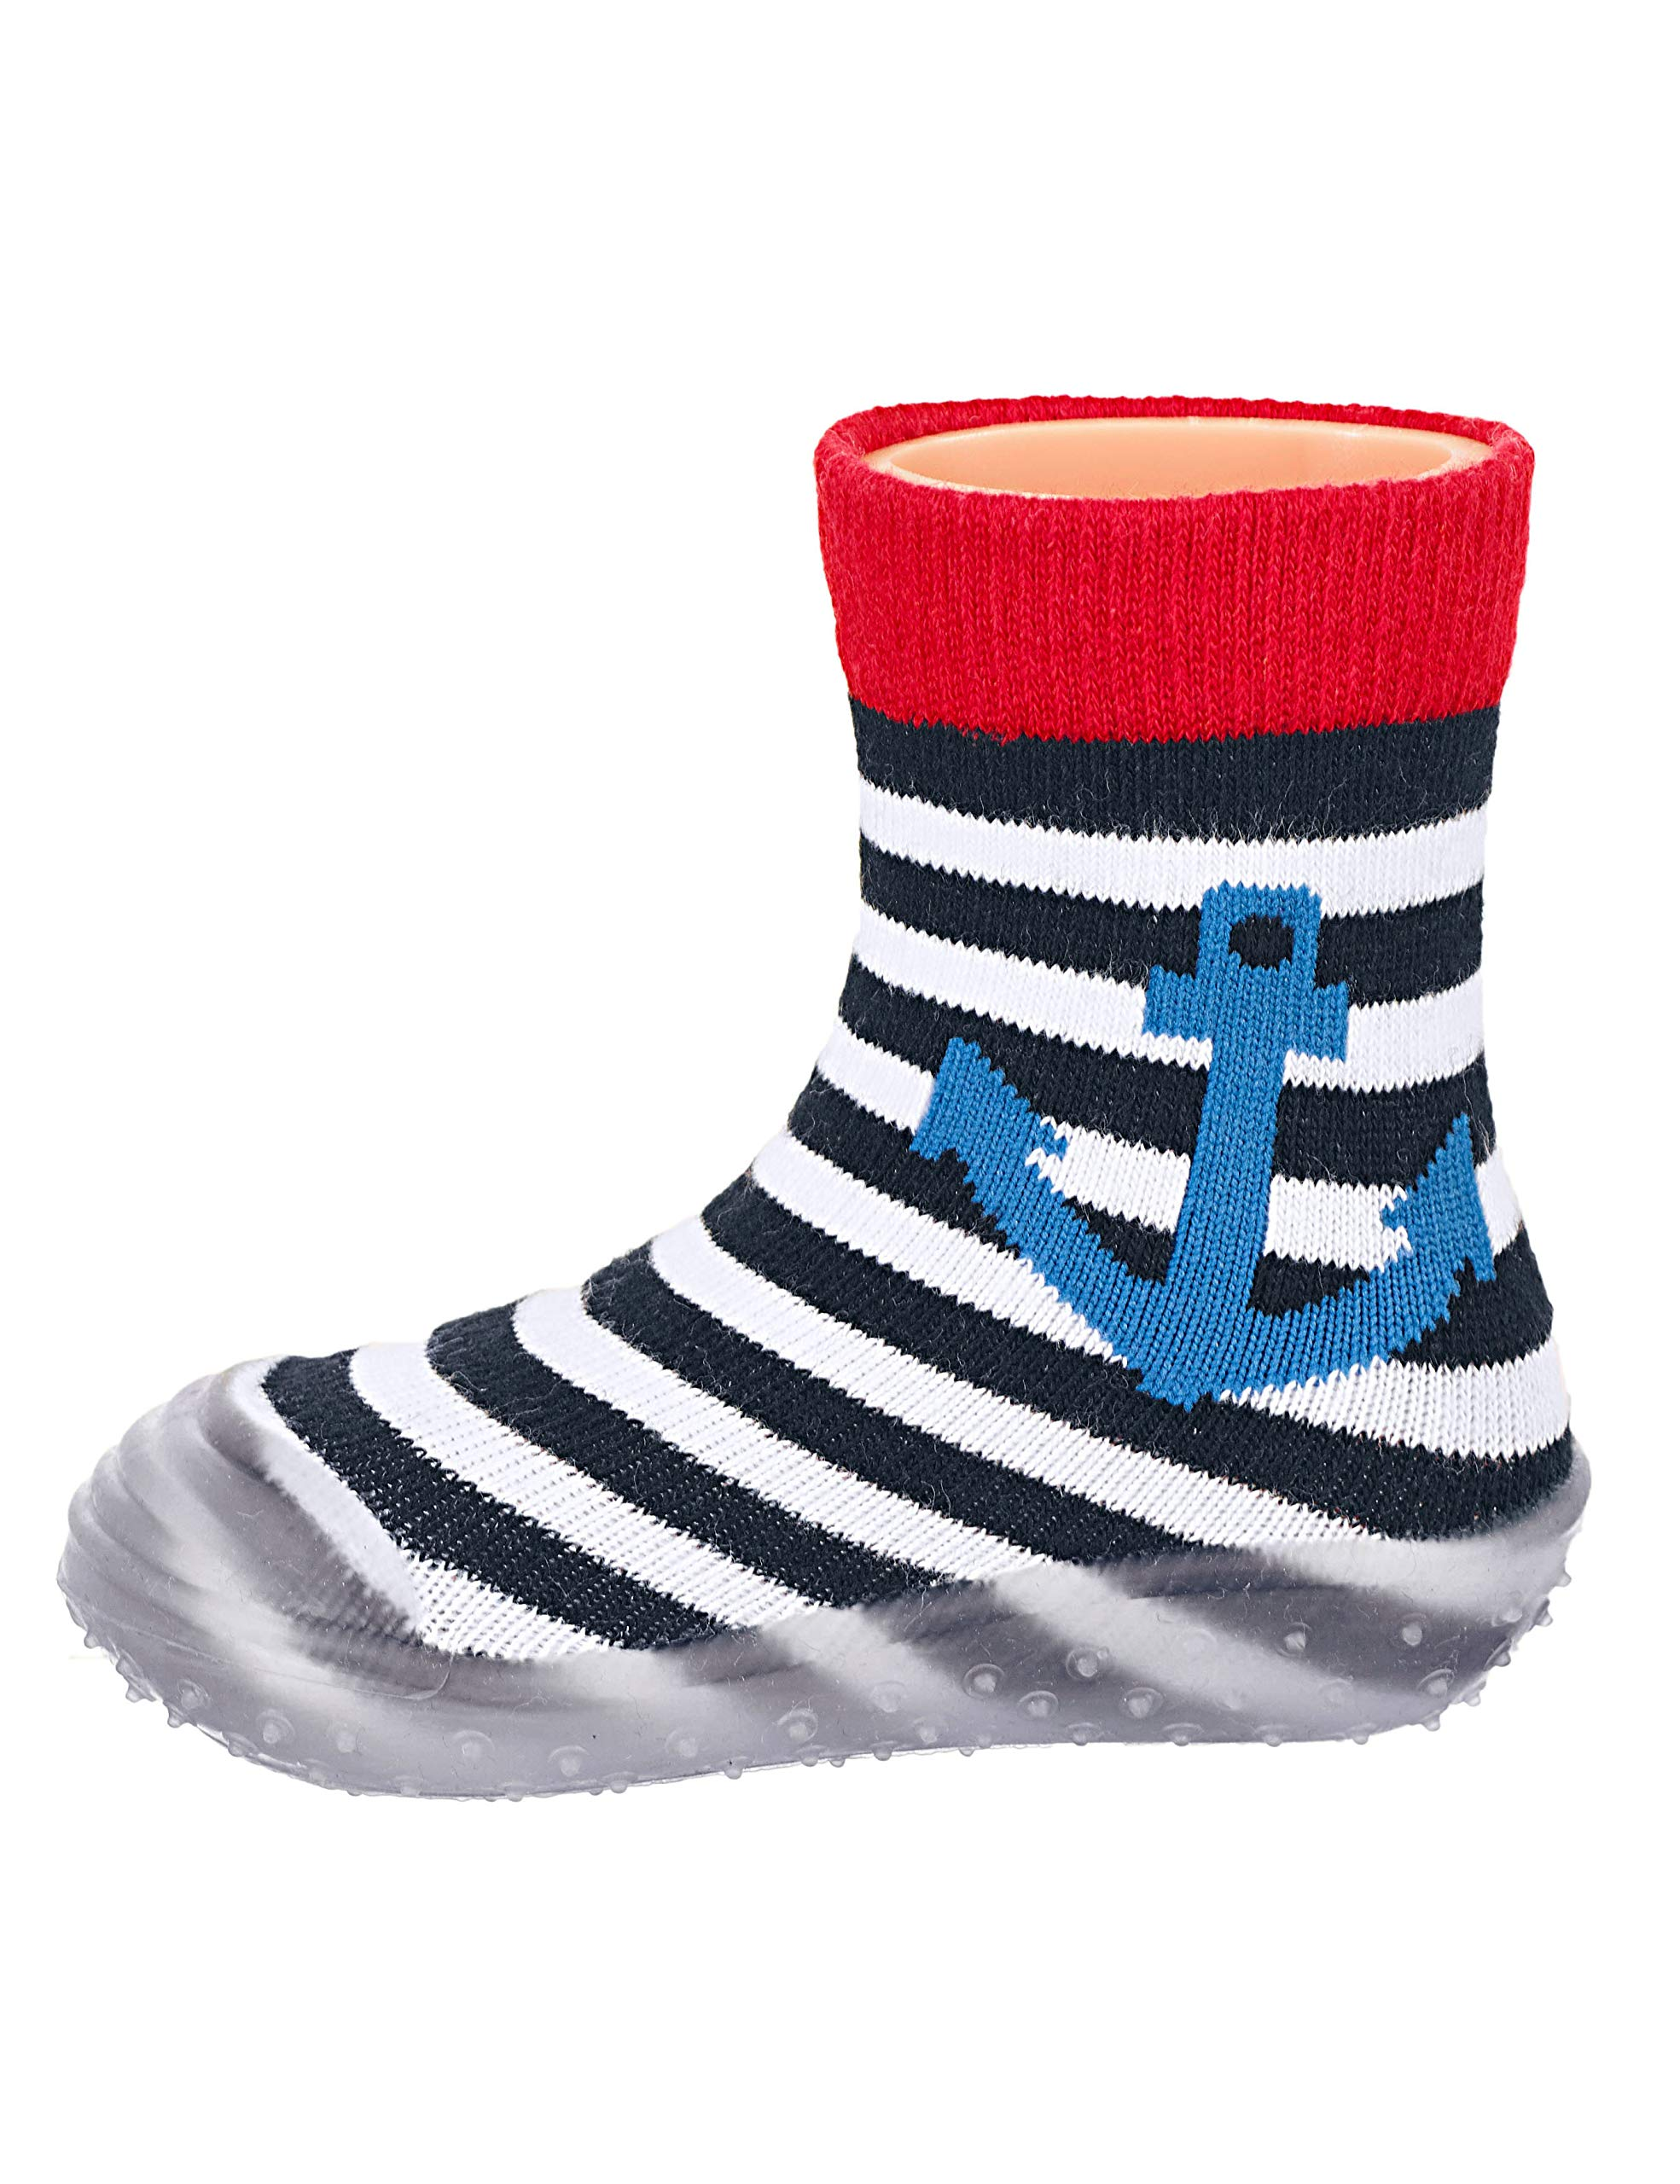 Sterntaler Adventure-Socks Anker, Zapatillas Impermeables para Niños 2